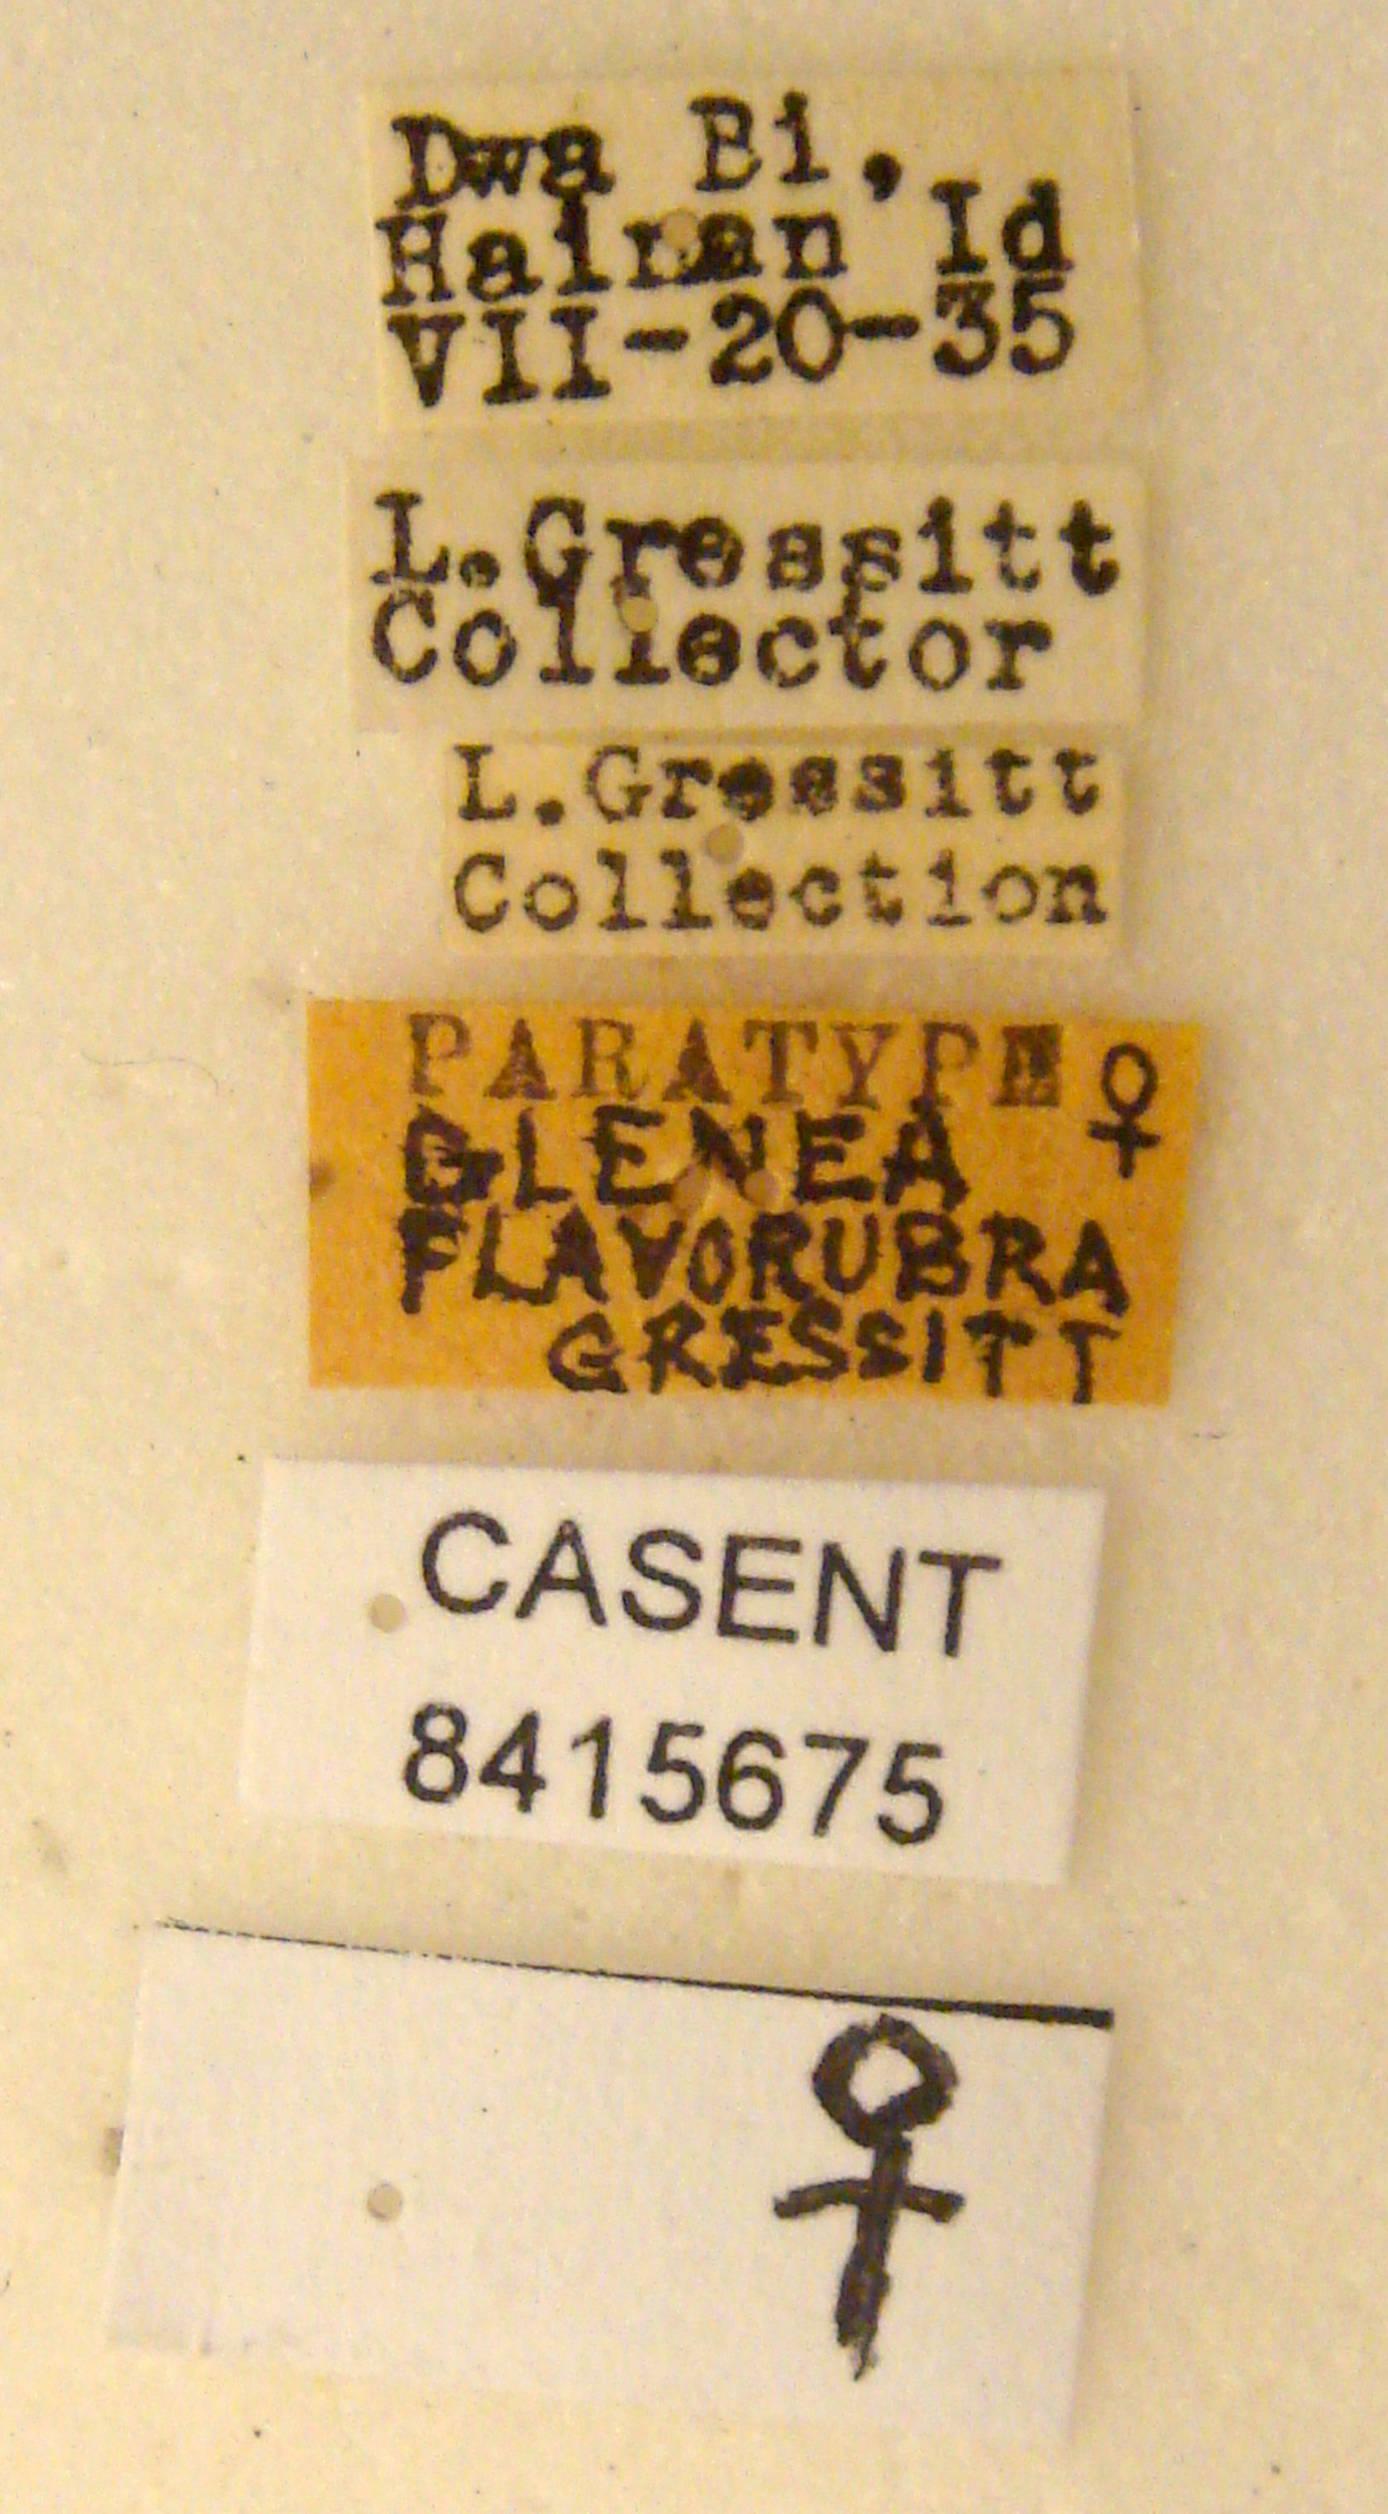 Glenea flavorubra image